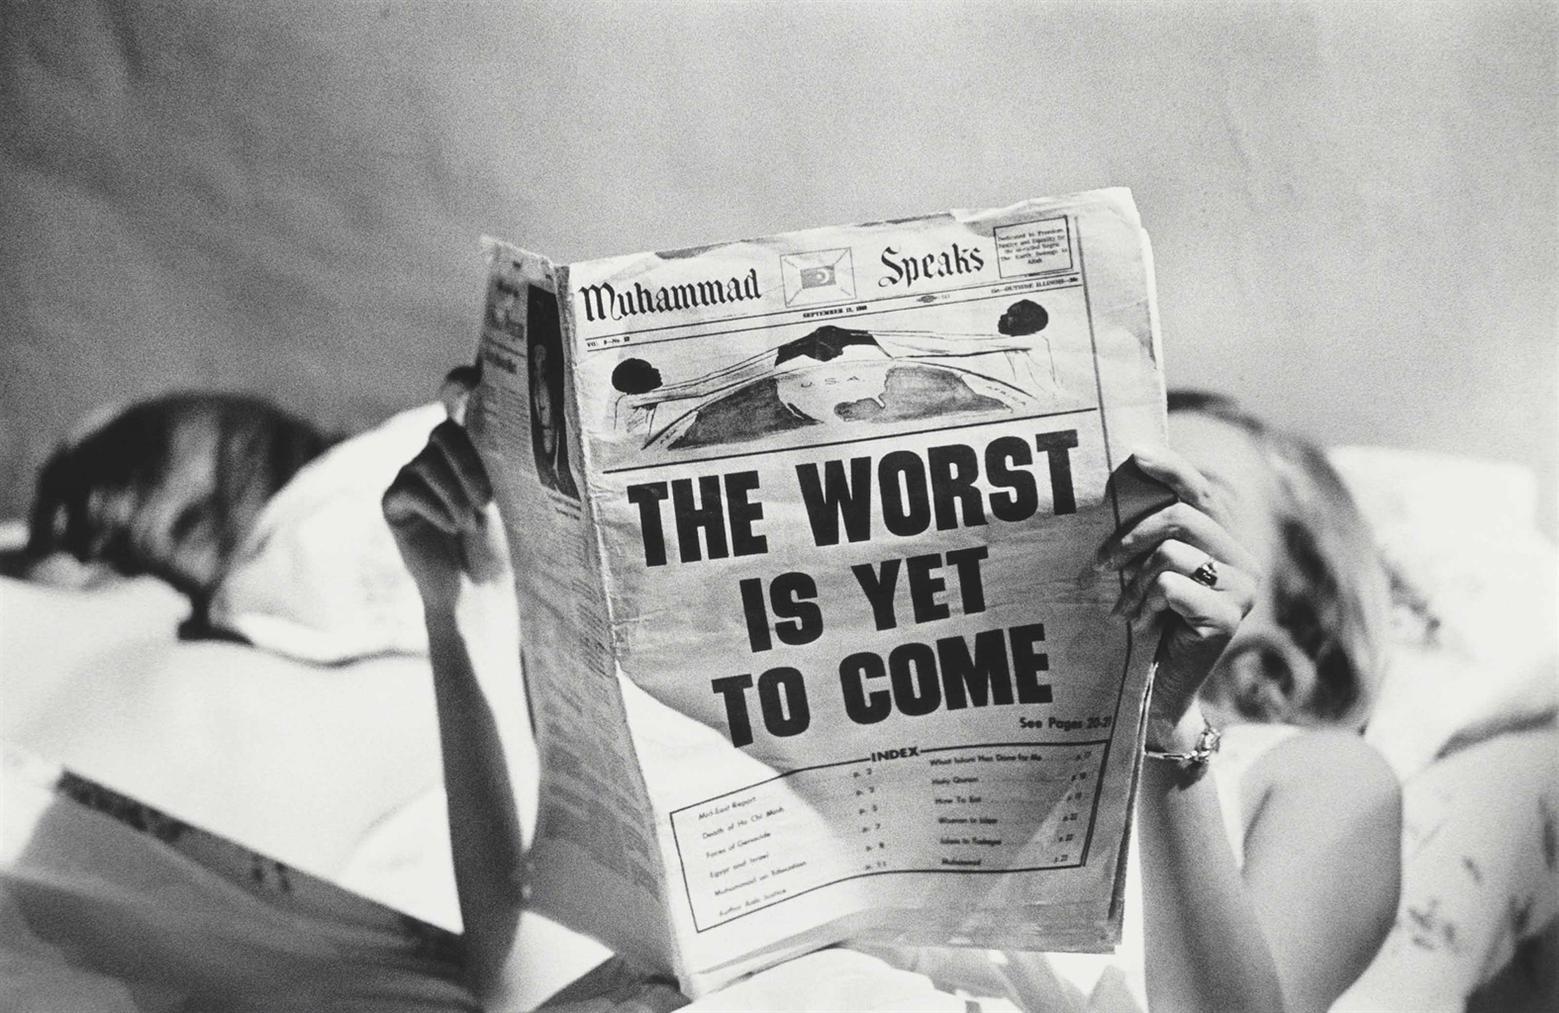 Steve Schapiro - The Worst Is Yet To Come, New York-1968